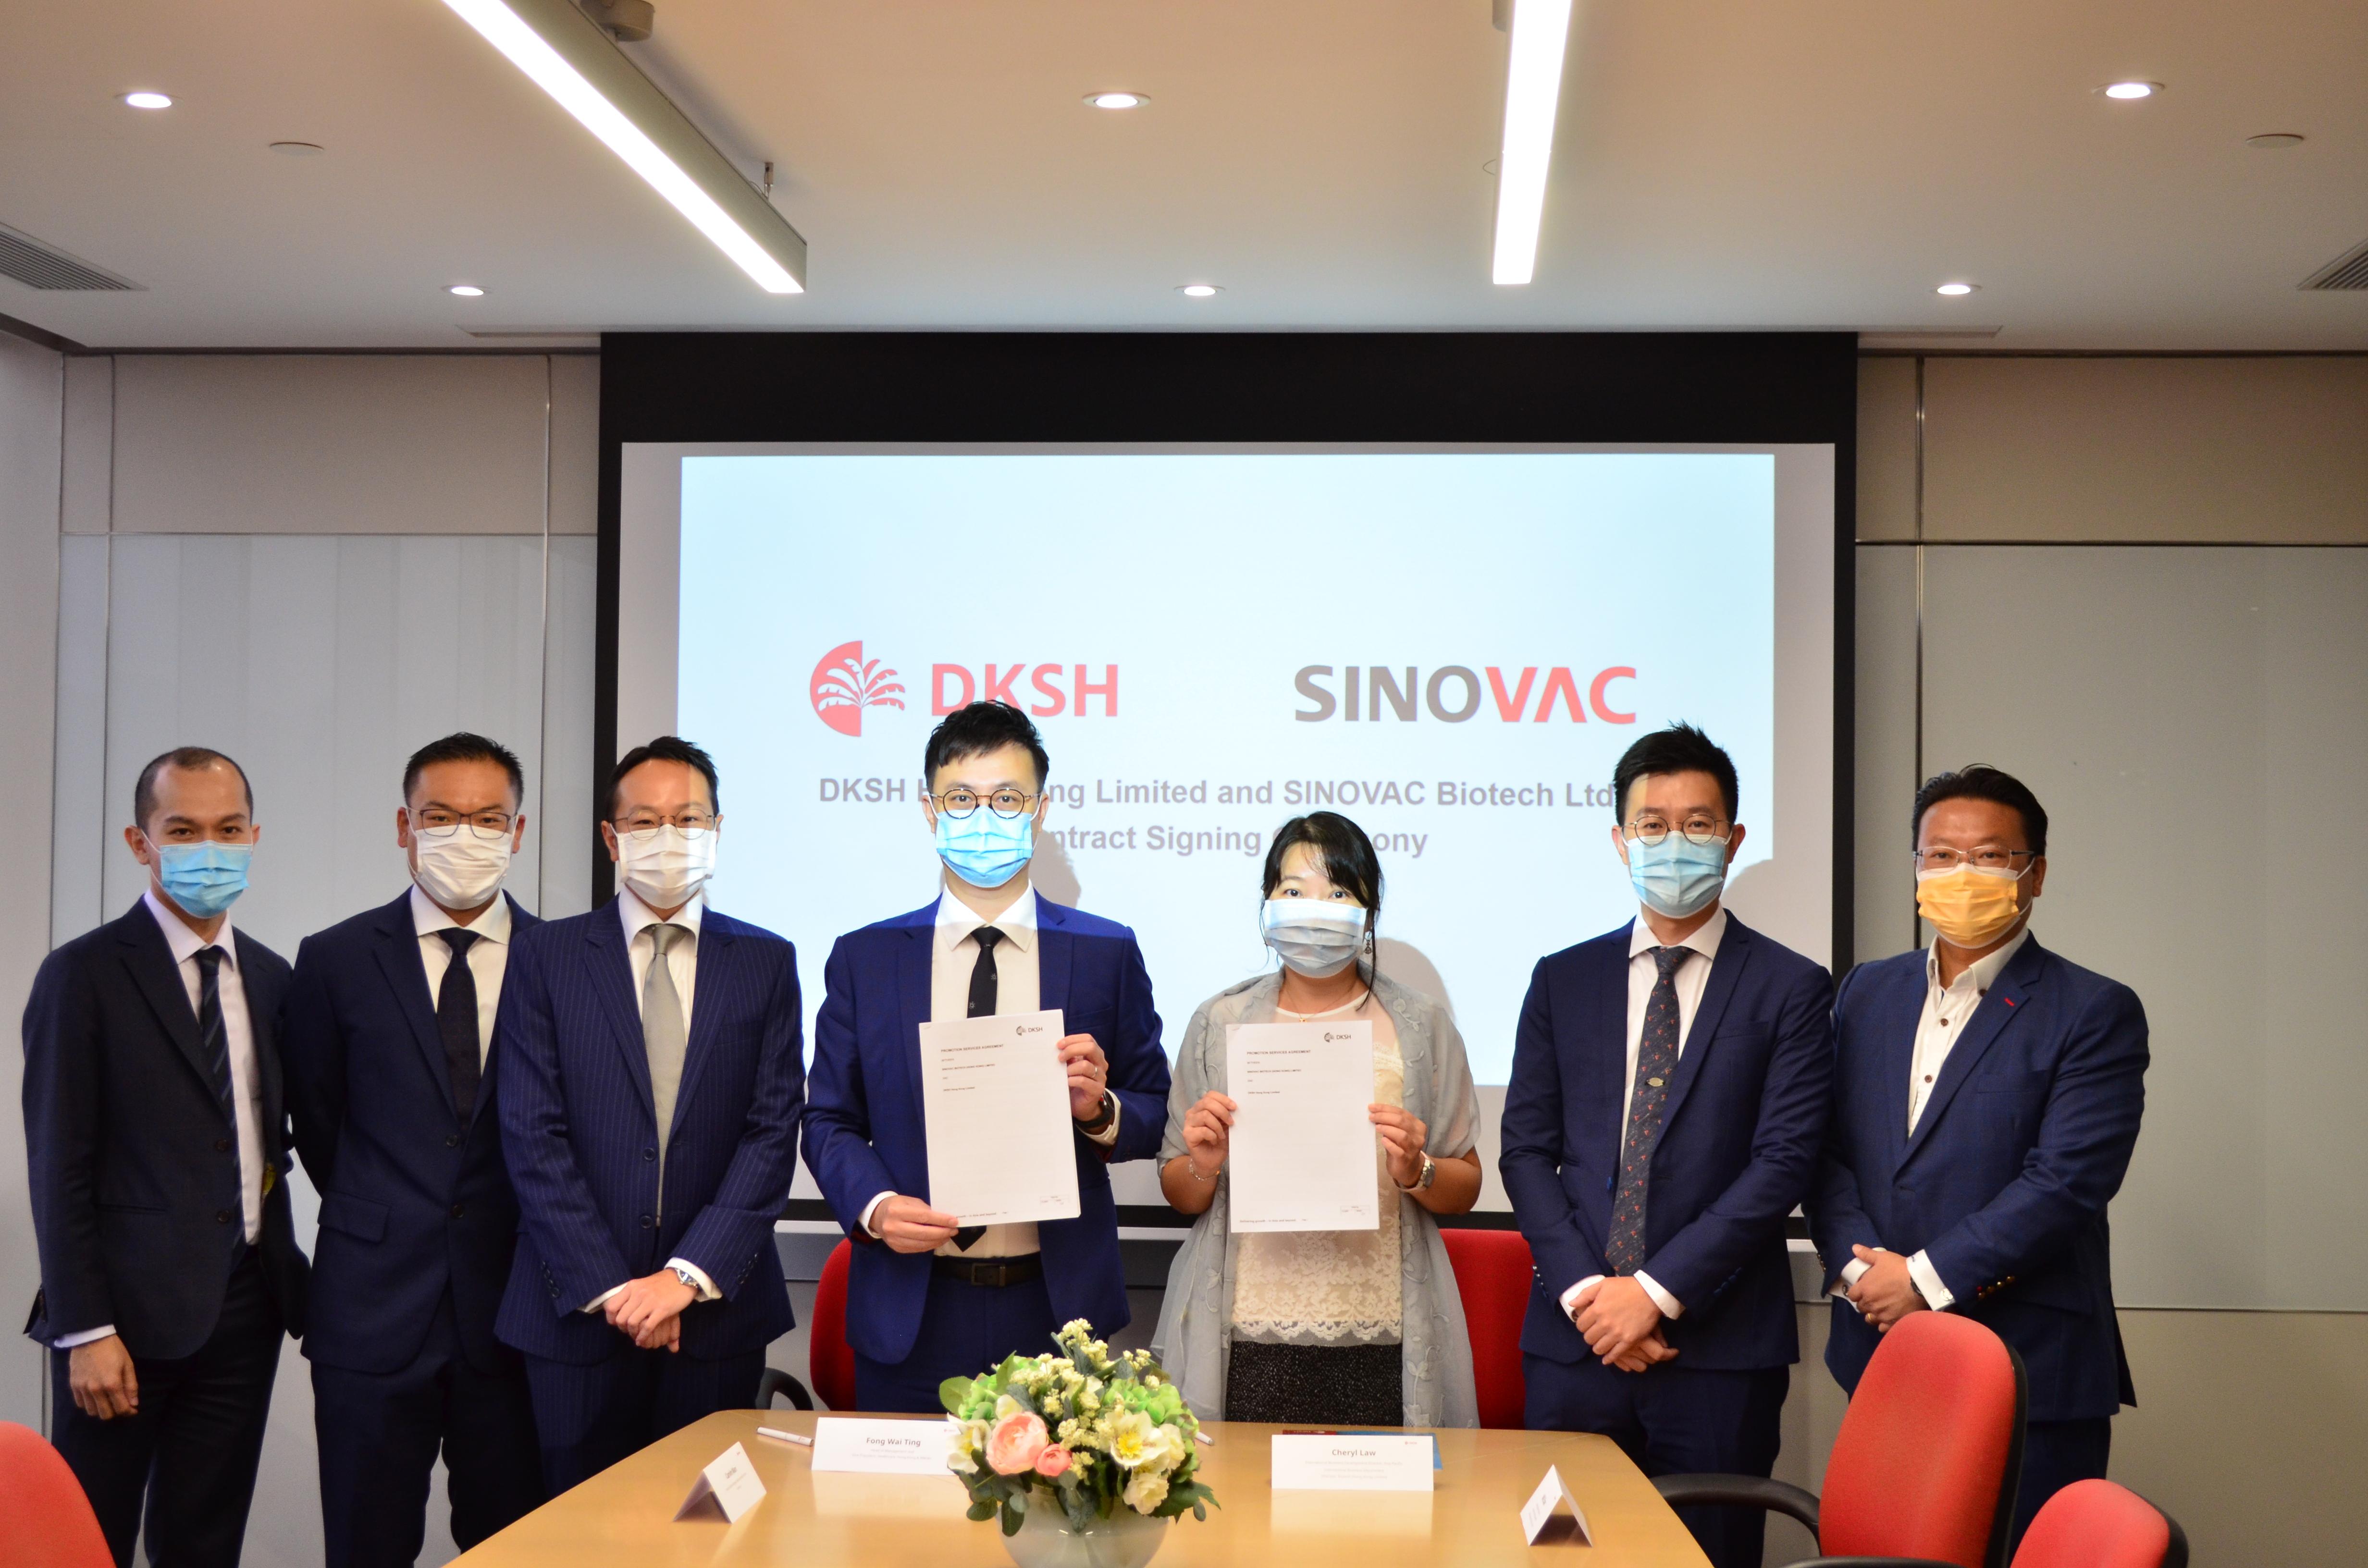 DKSH Hong Kong and SINOVAC Sign Partnership to Strengthen CoronaVac®Network in Hong Kong